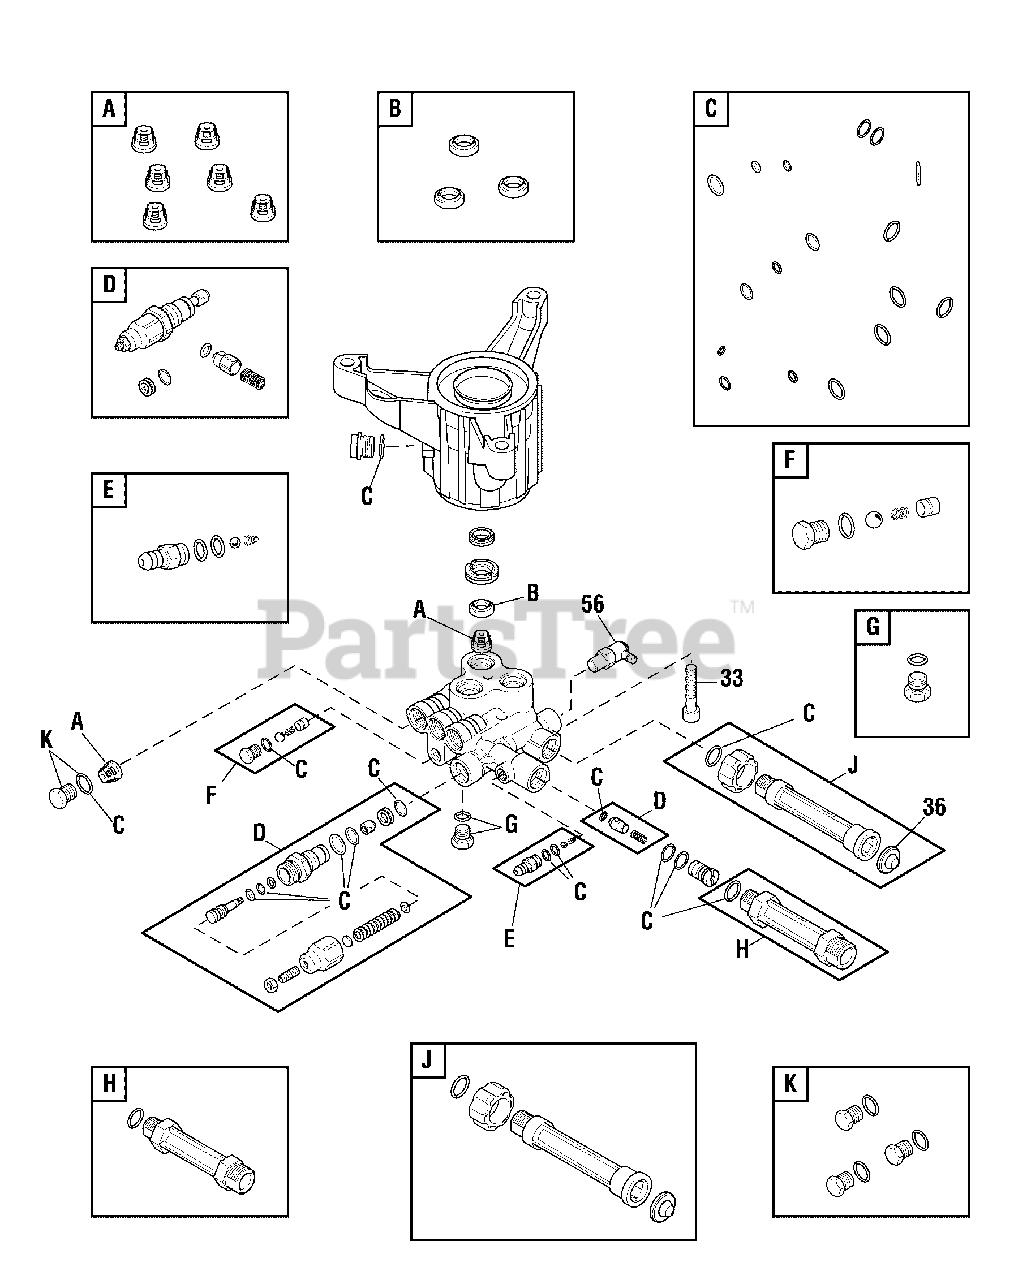 Troy-Bilt 020568-02 - Troy-Bilt 2,800 PSI Pressure Washer ...